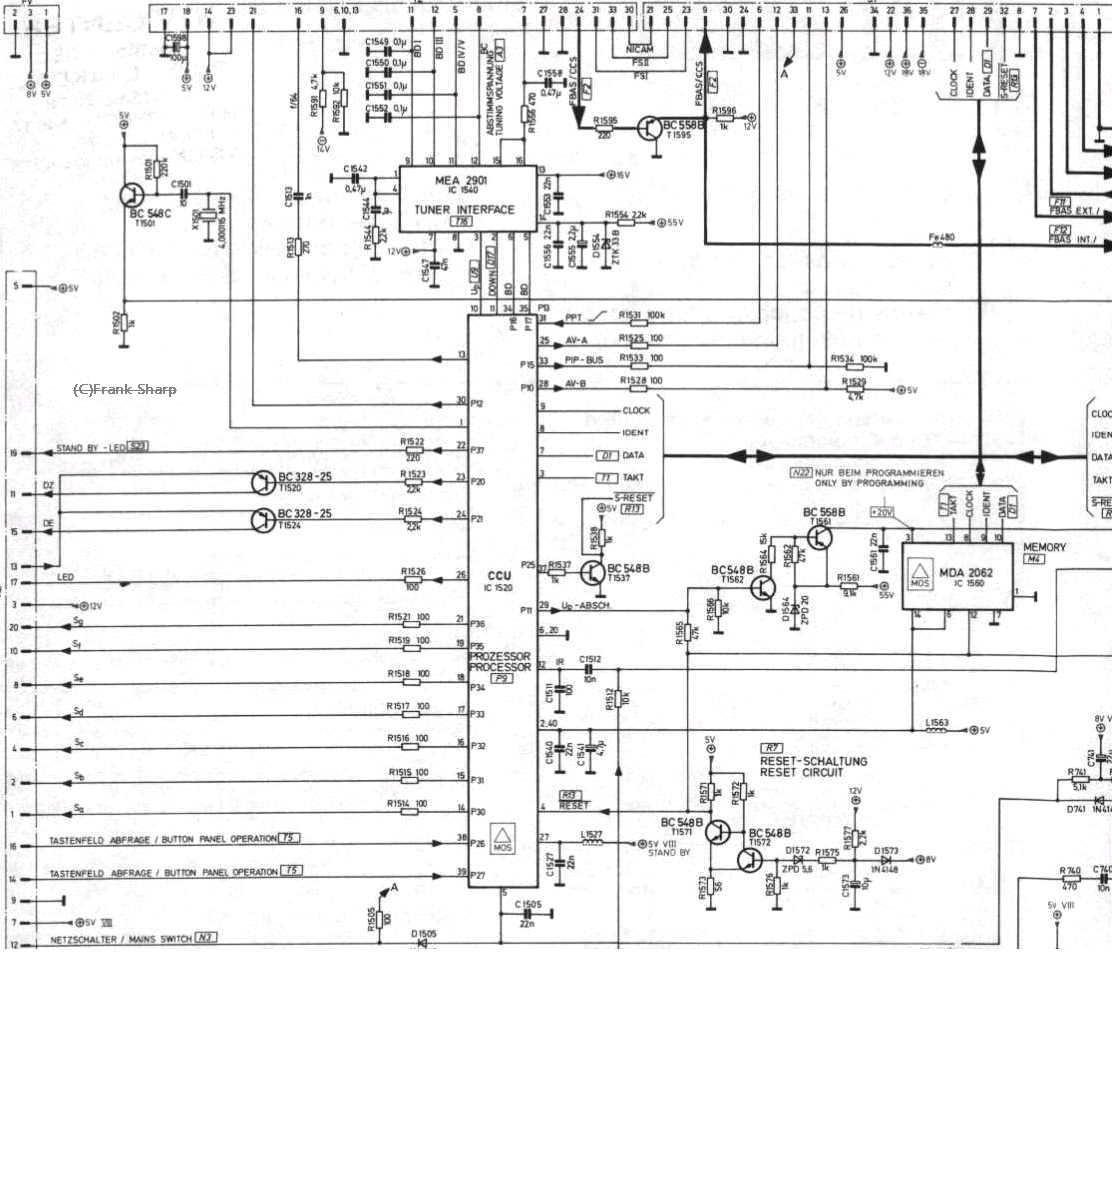 edenpure model 500 wiring diagram heat map diagram wiring EdenPURE Quartz Infrared Portable Heater Infrared Heaters